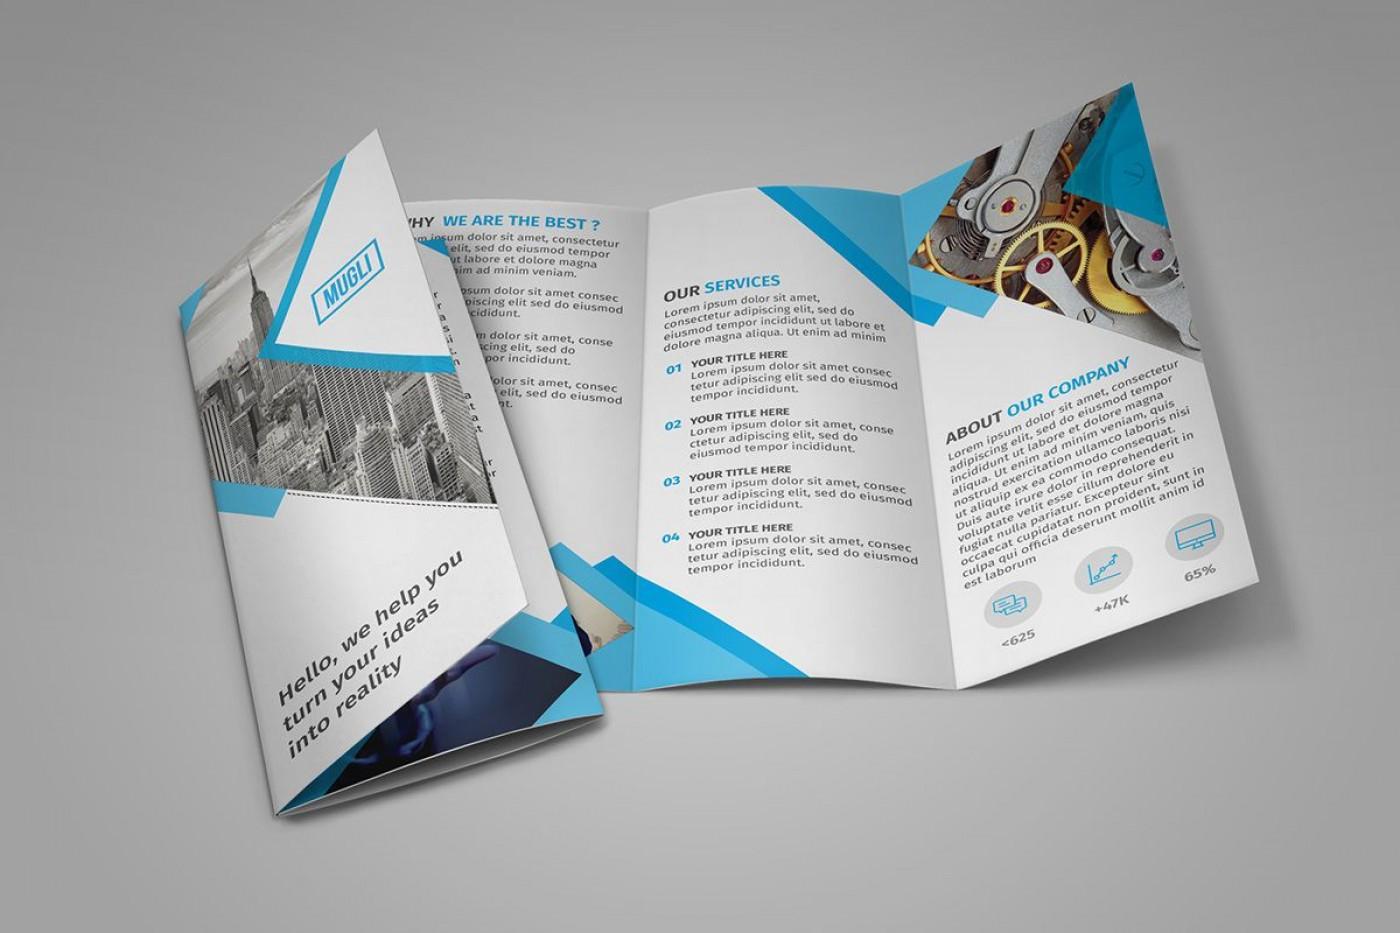 004 Fantastic Tri Fold Brochure Template Free Highest Quality  Download Photoshop M Word Tri-fold Indesign Mac1400